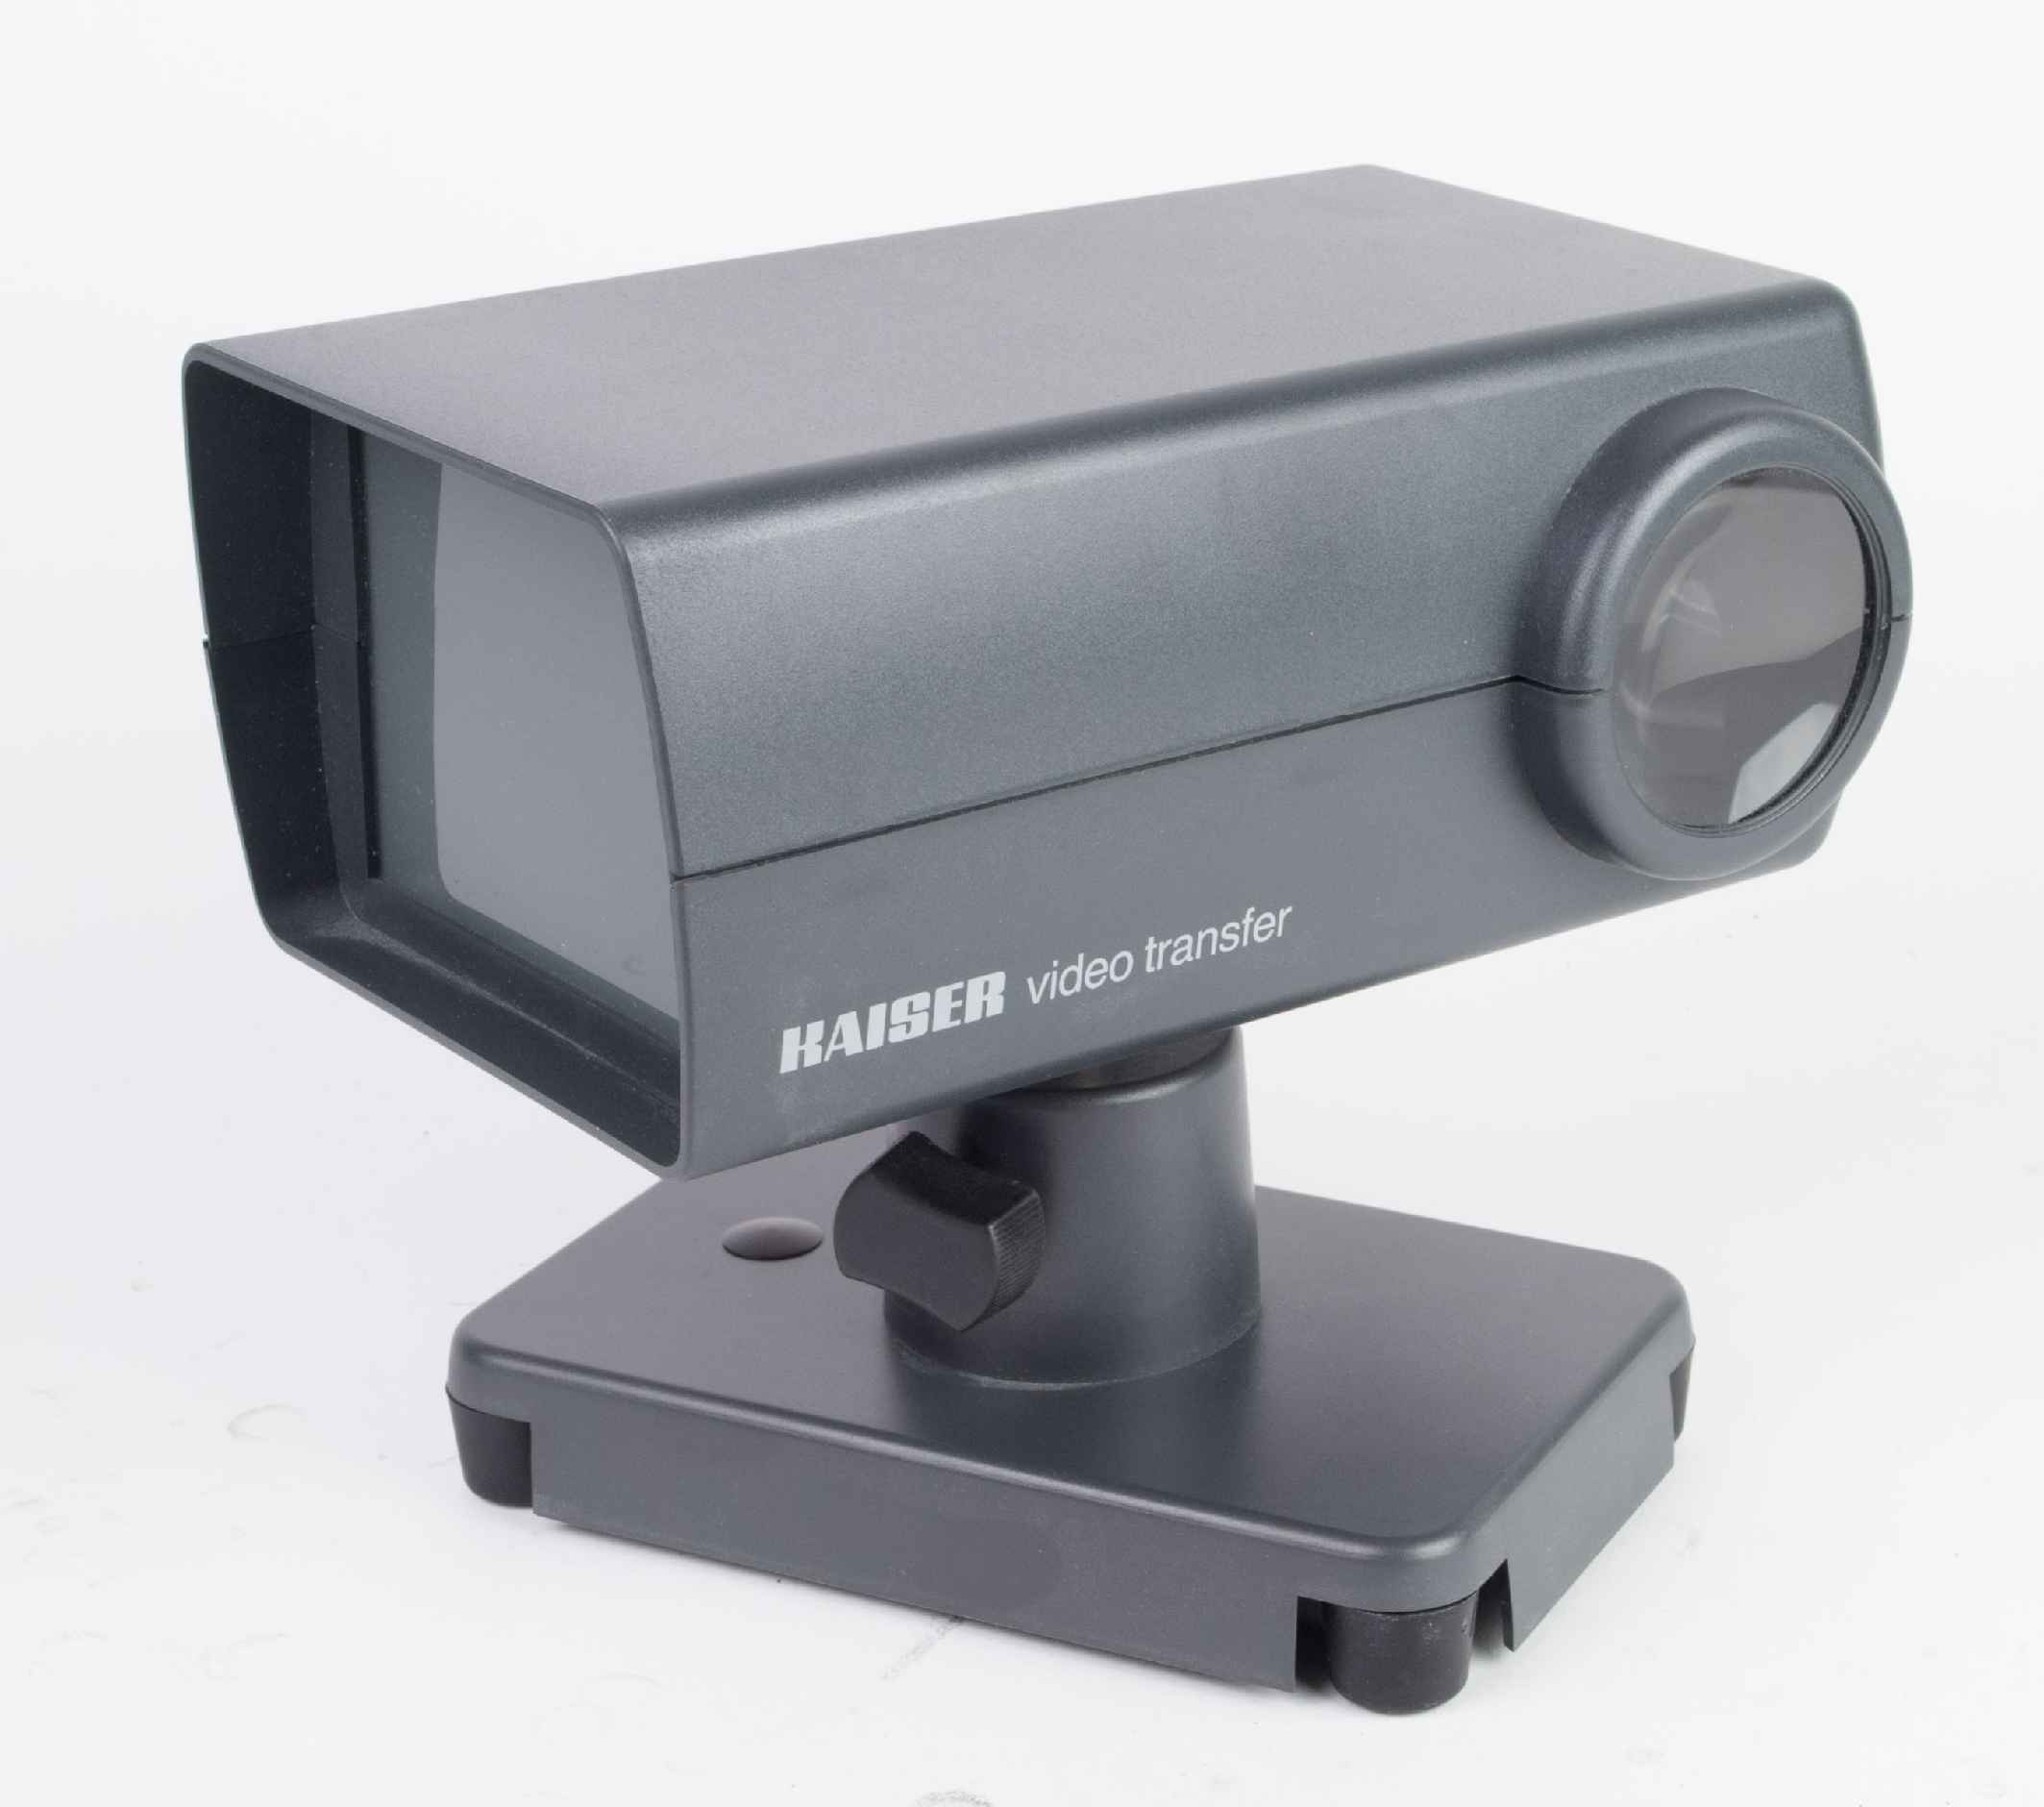 Kaiser Video Transfer 96652 (gebruikt)